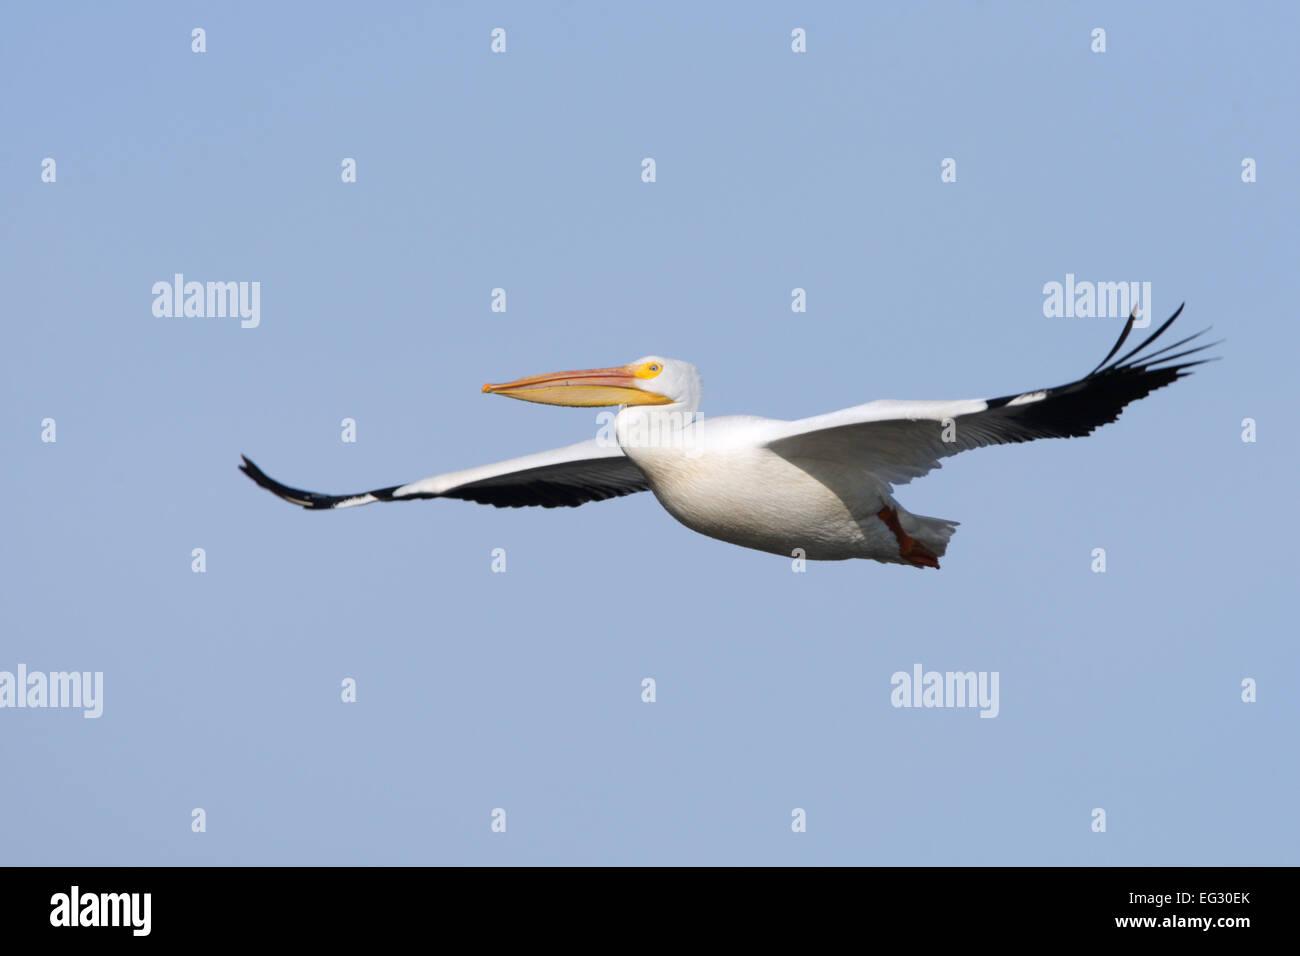 White Pelican Flying - Stock Image